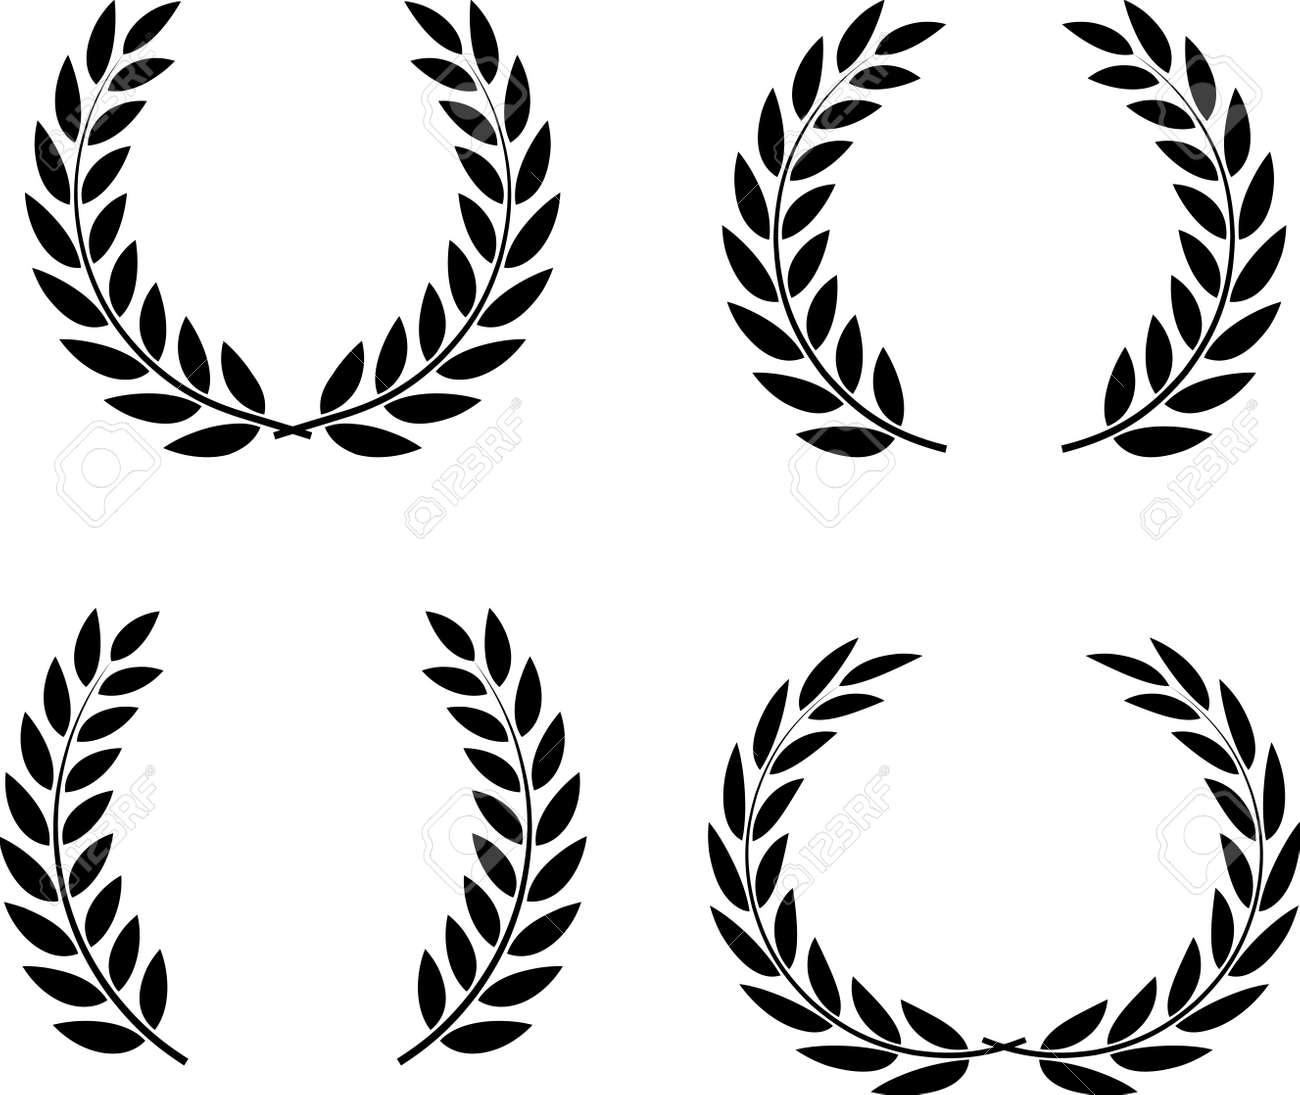 Laurel wreaths set vector isolated - 52870395